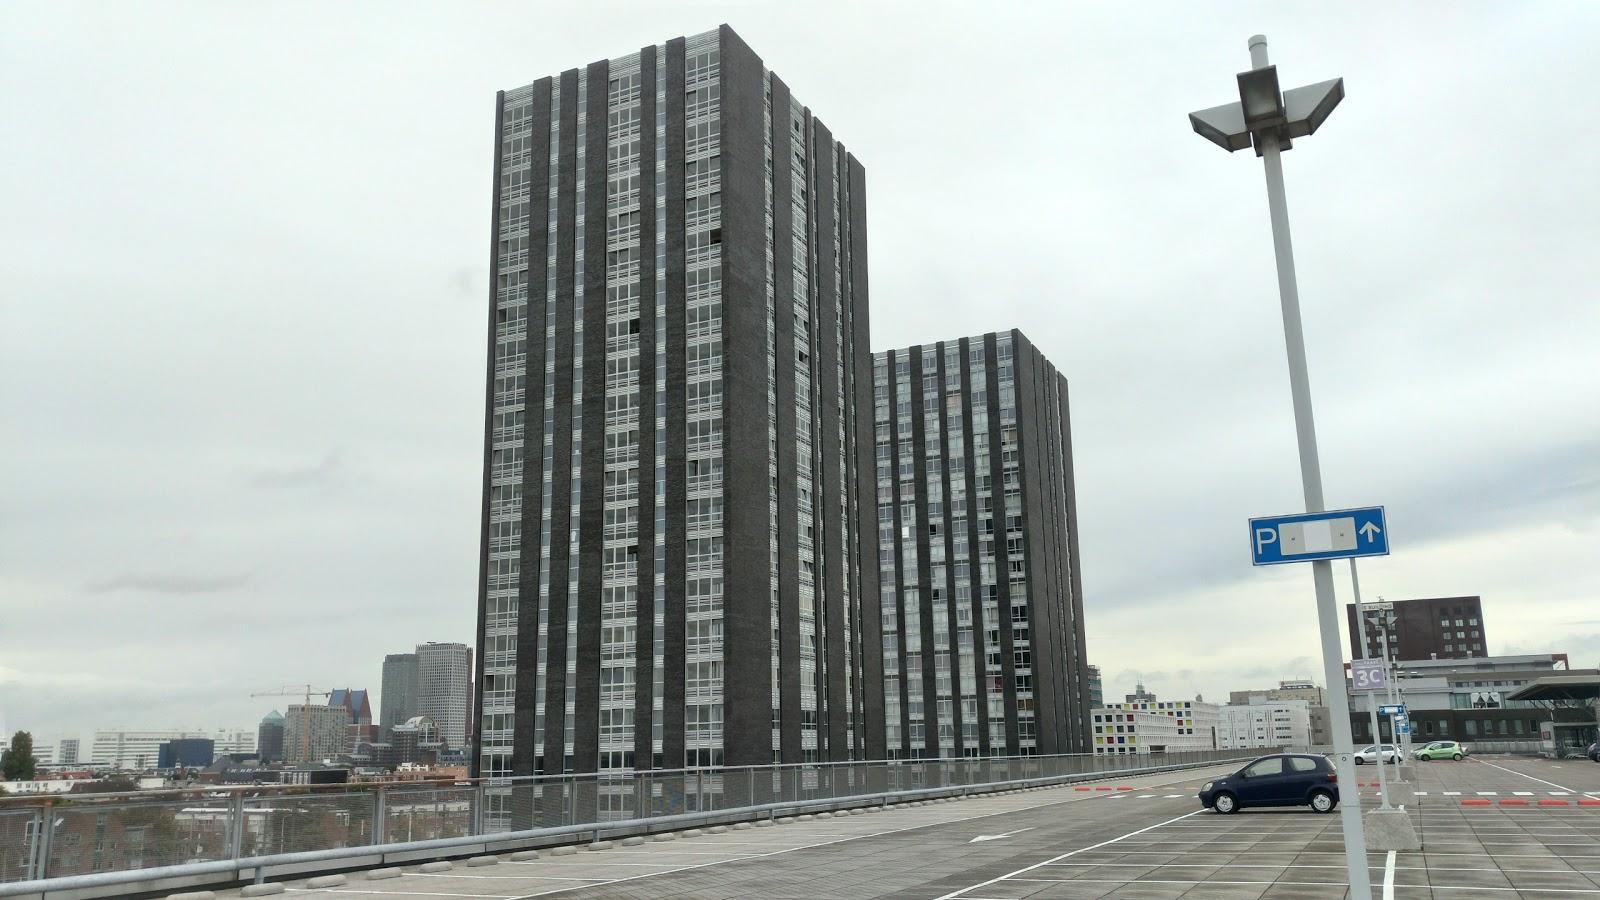 ANWB Parking Megastores Den-Haag accepteert American Express Credit Cards